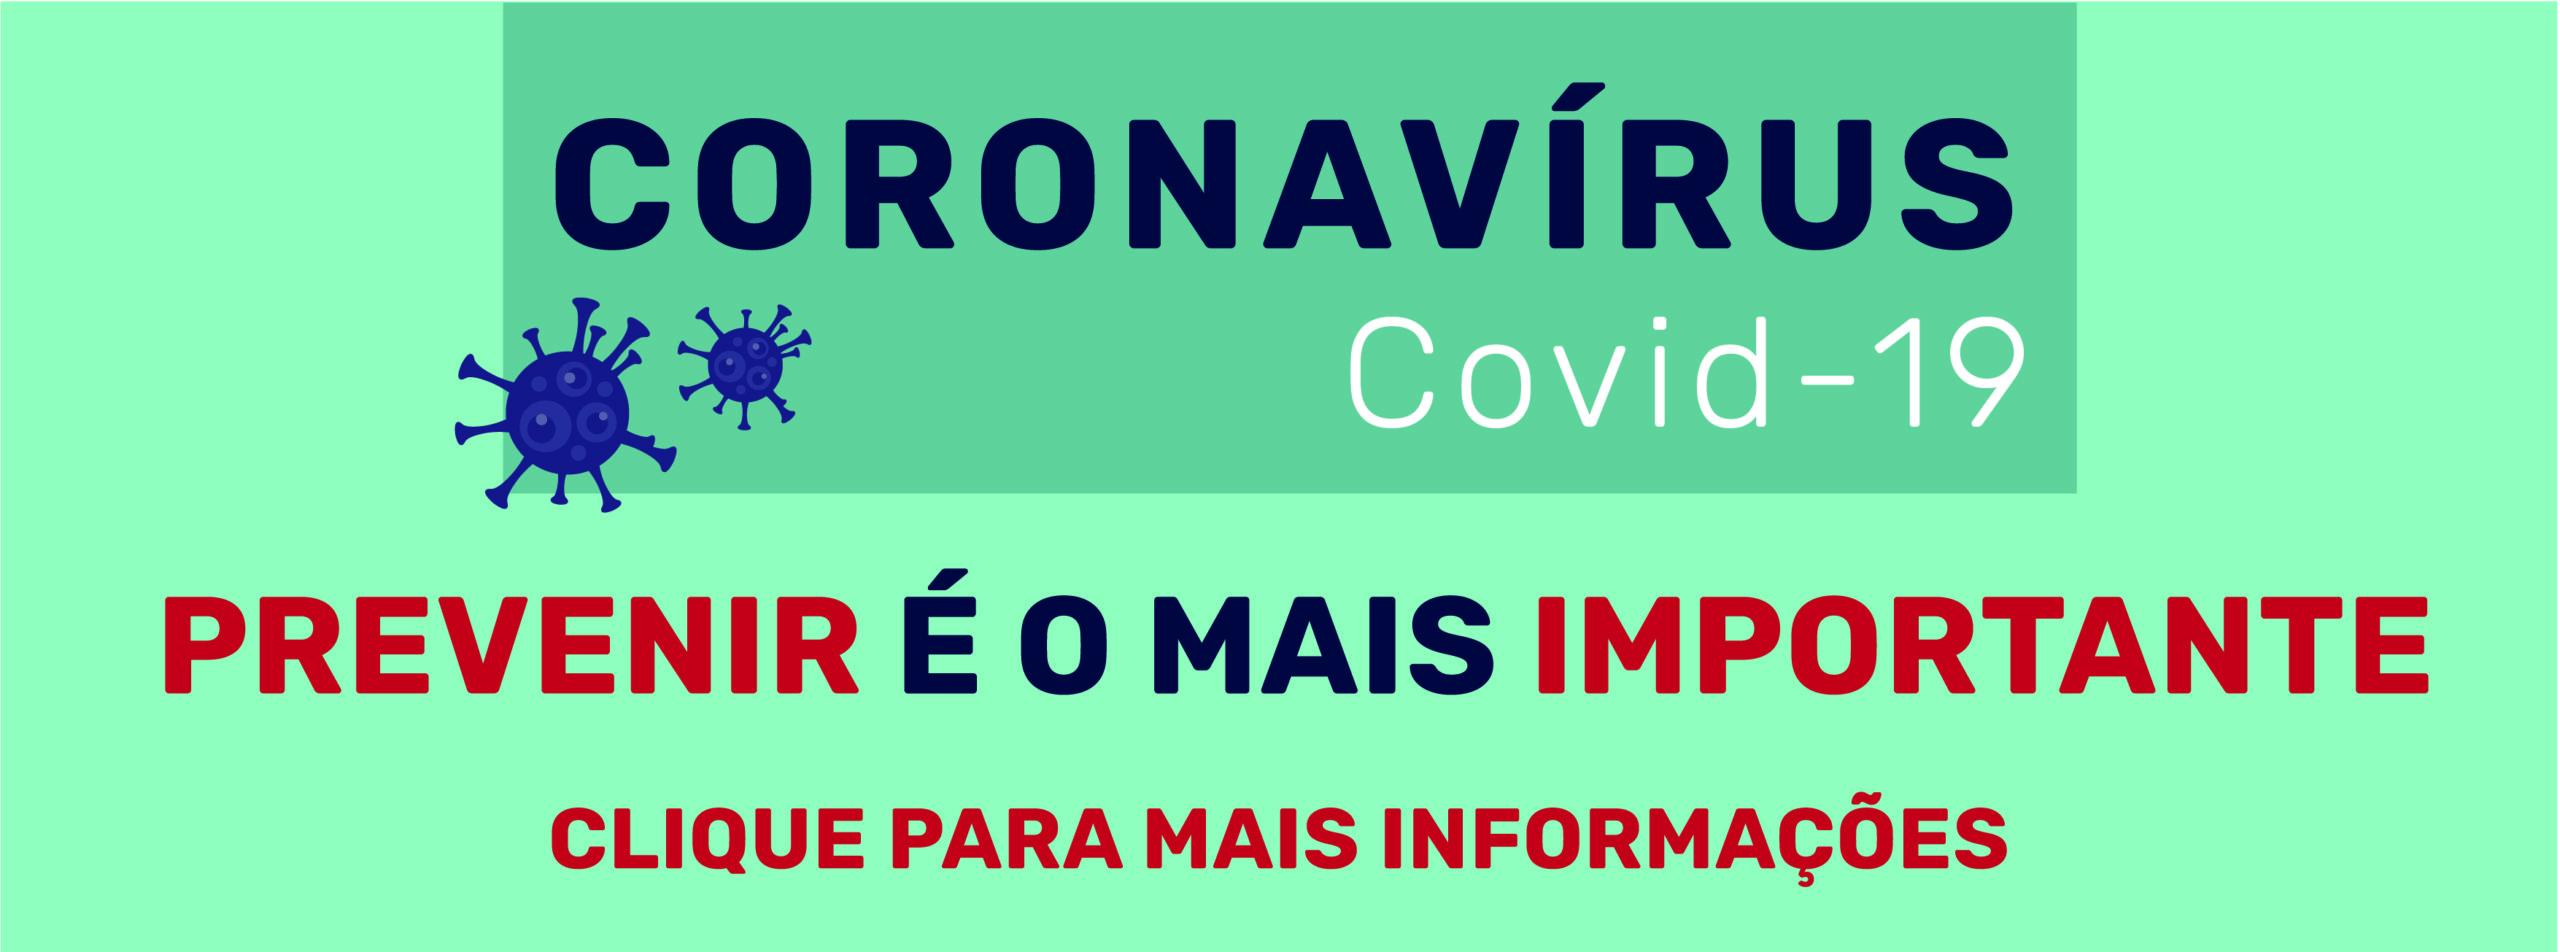 Campanha de combate ao Coronavírus